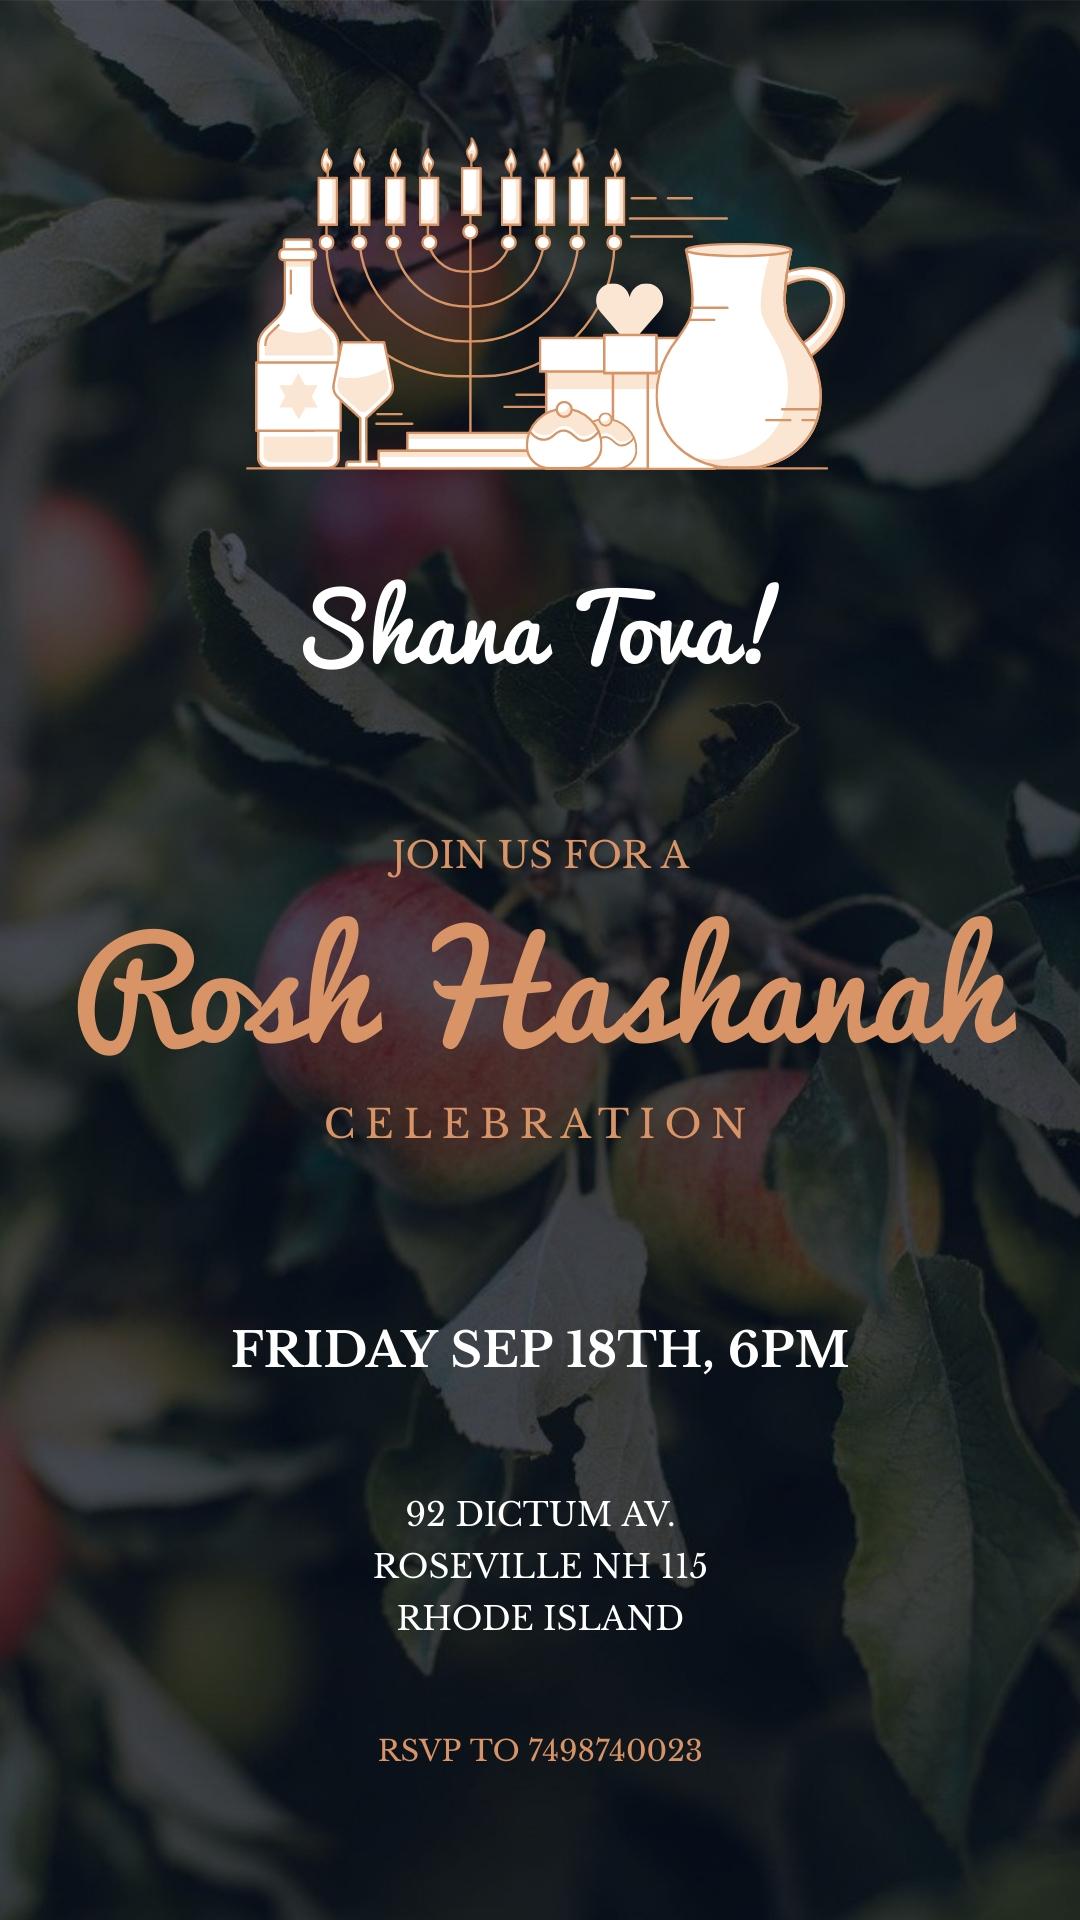 Rosh Hashanah Invitation Animated Vertical Template